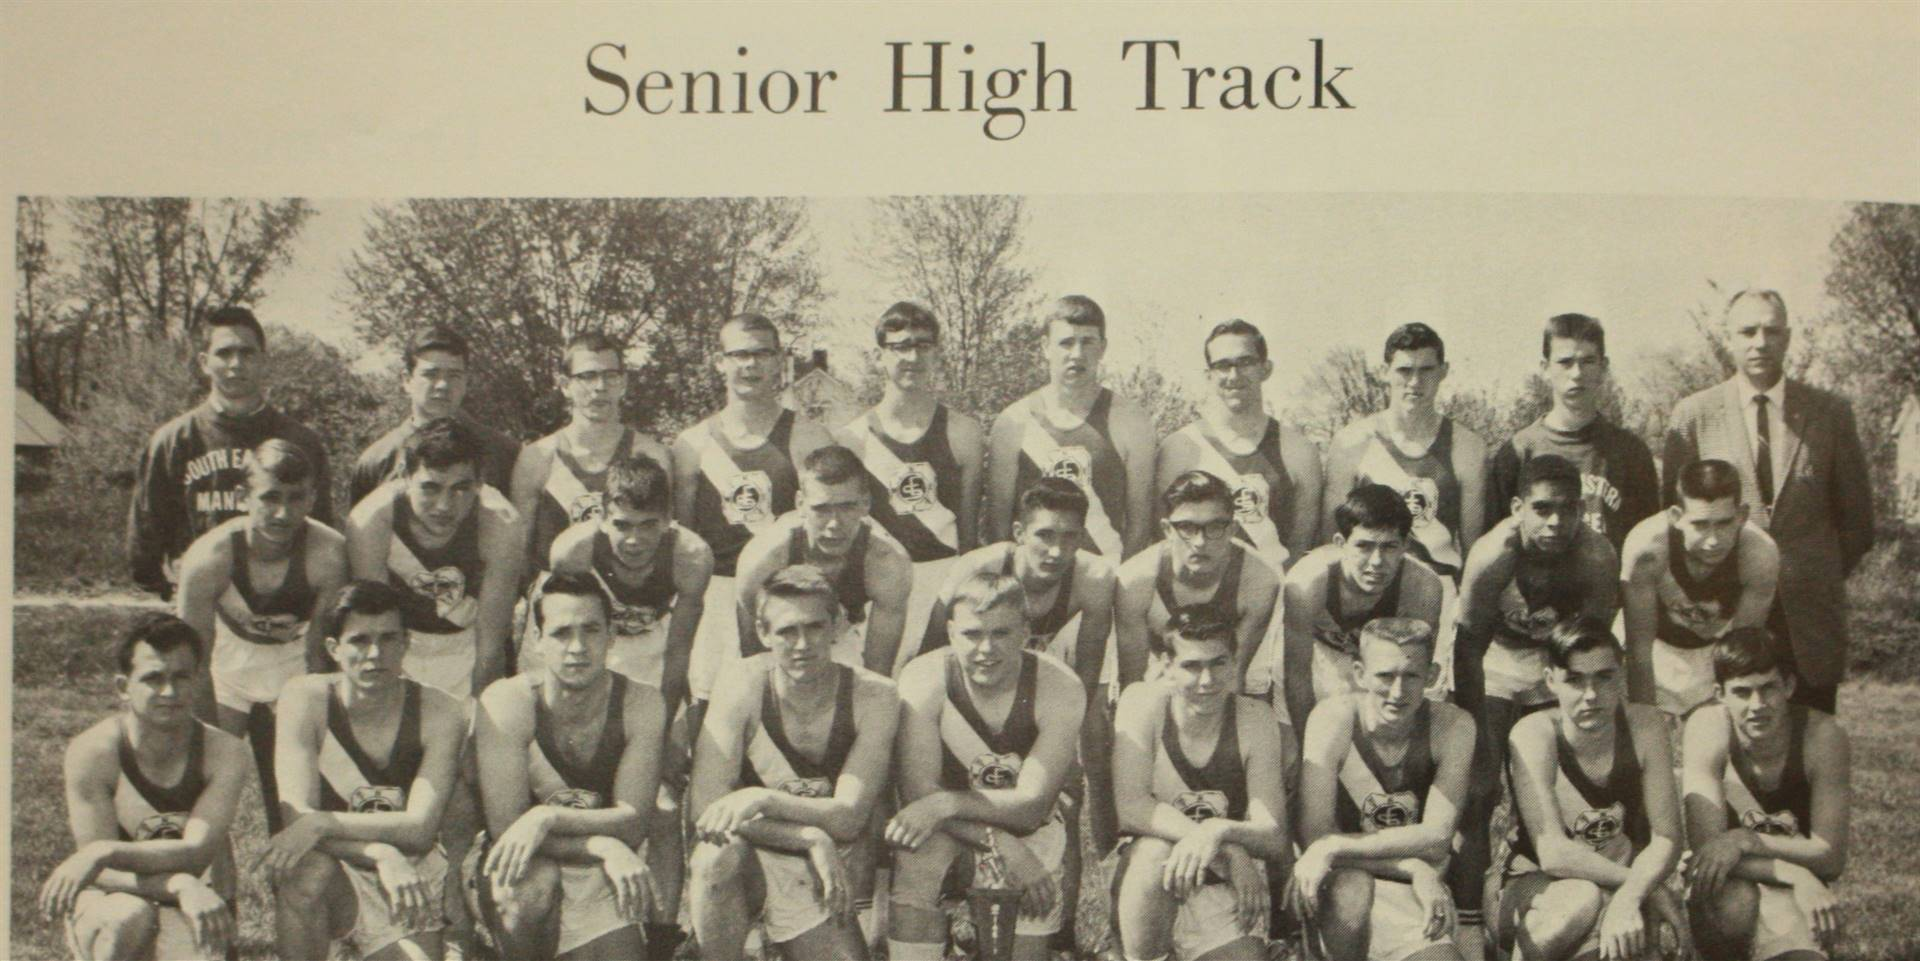 1966 Senior High Track